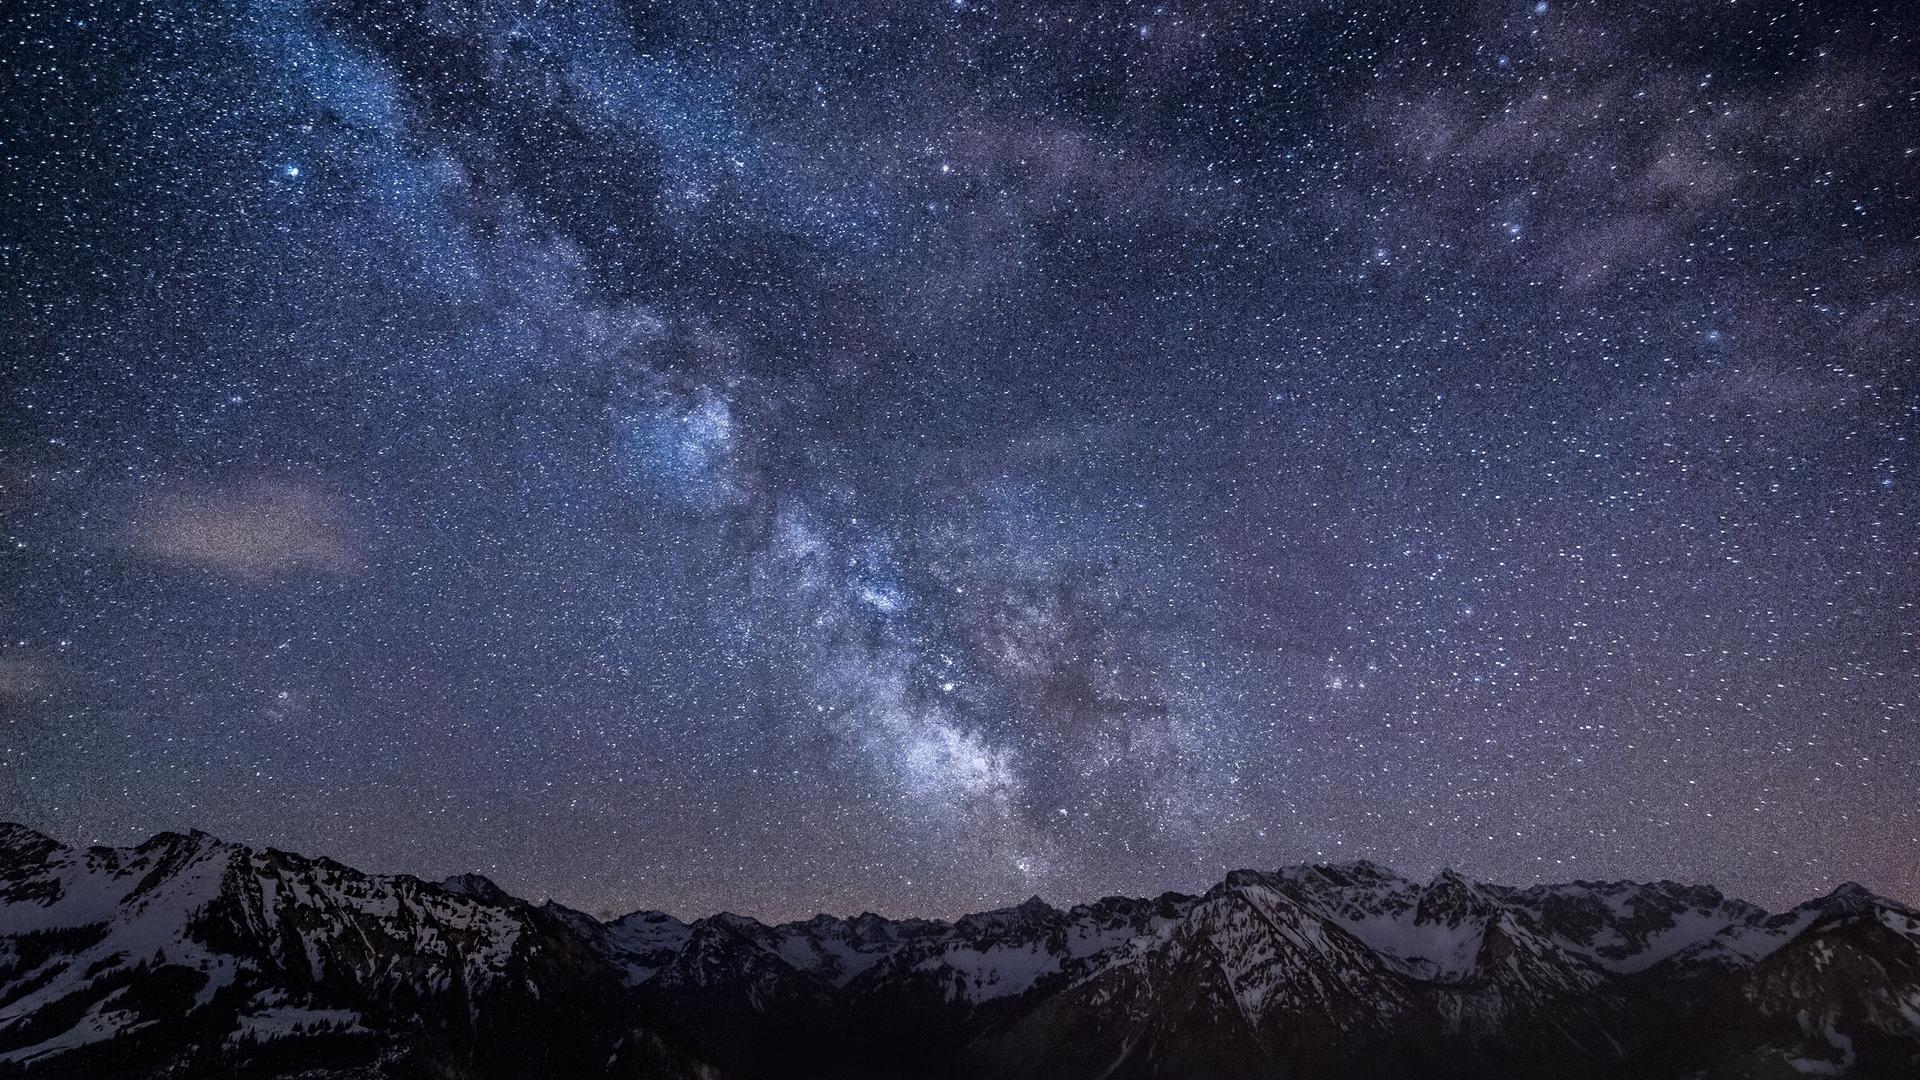 night sky wallpapers, full hd 1080p, best hd night sky pics, desktop